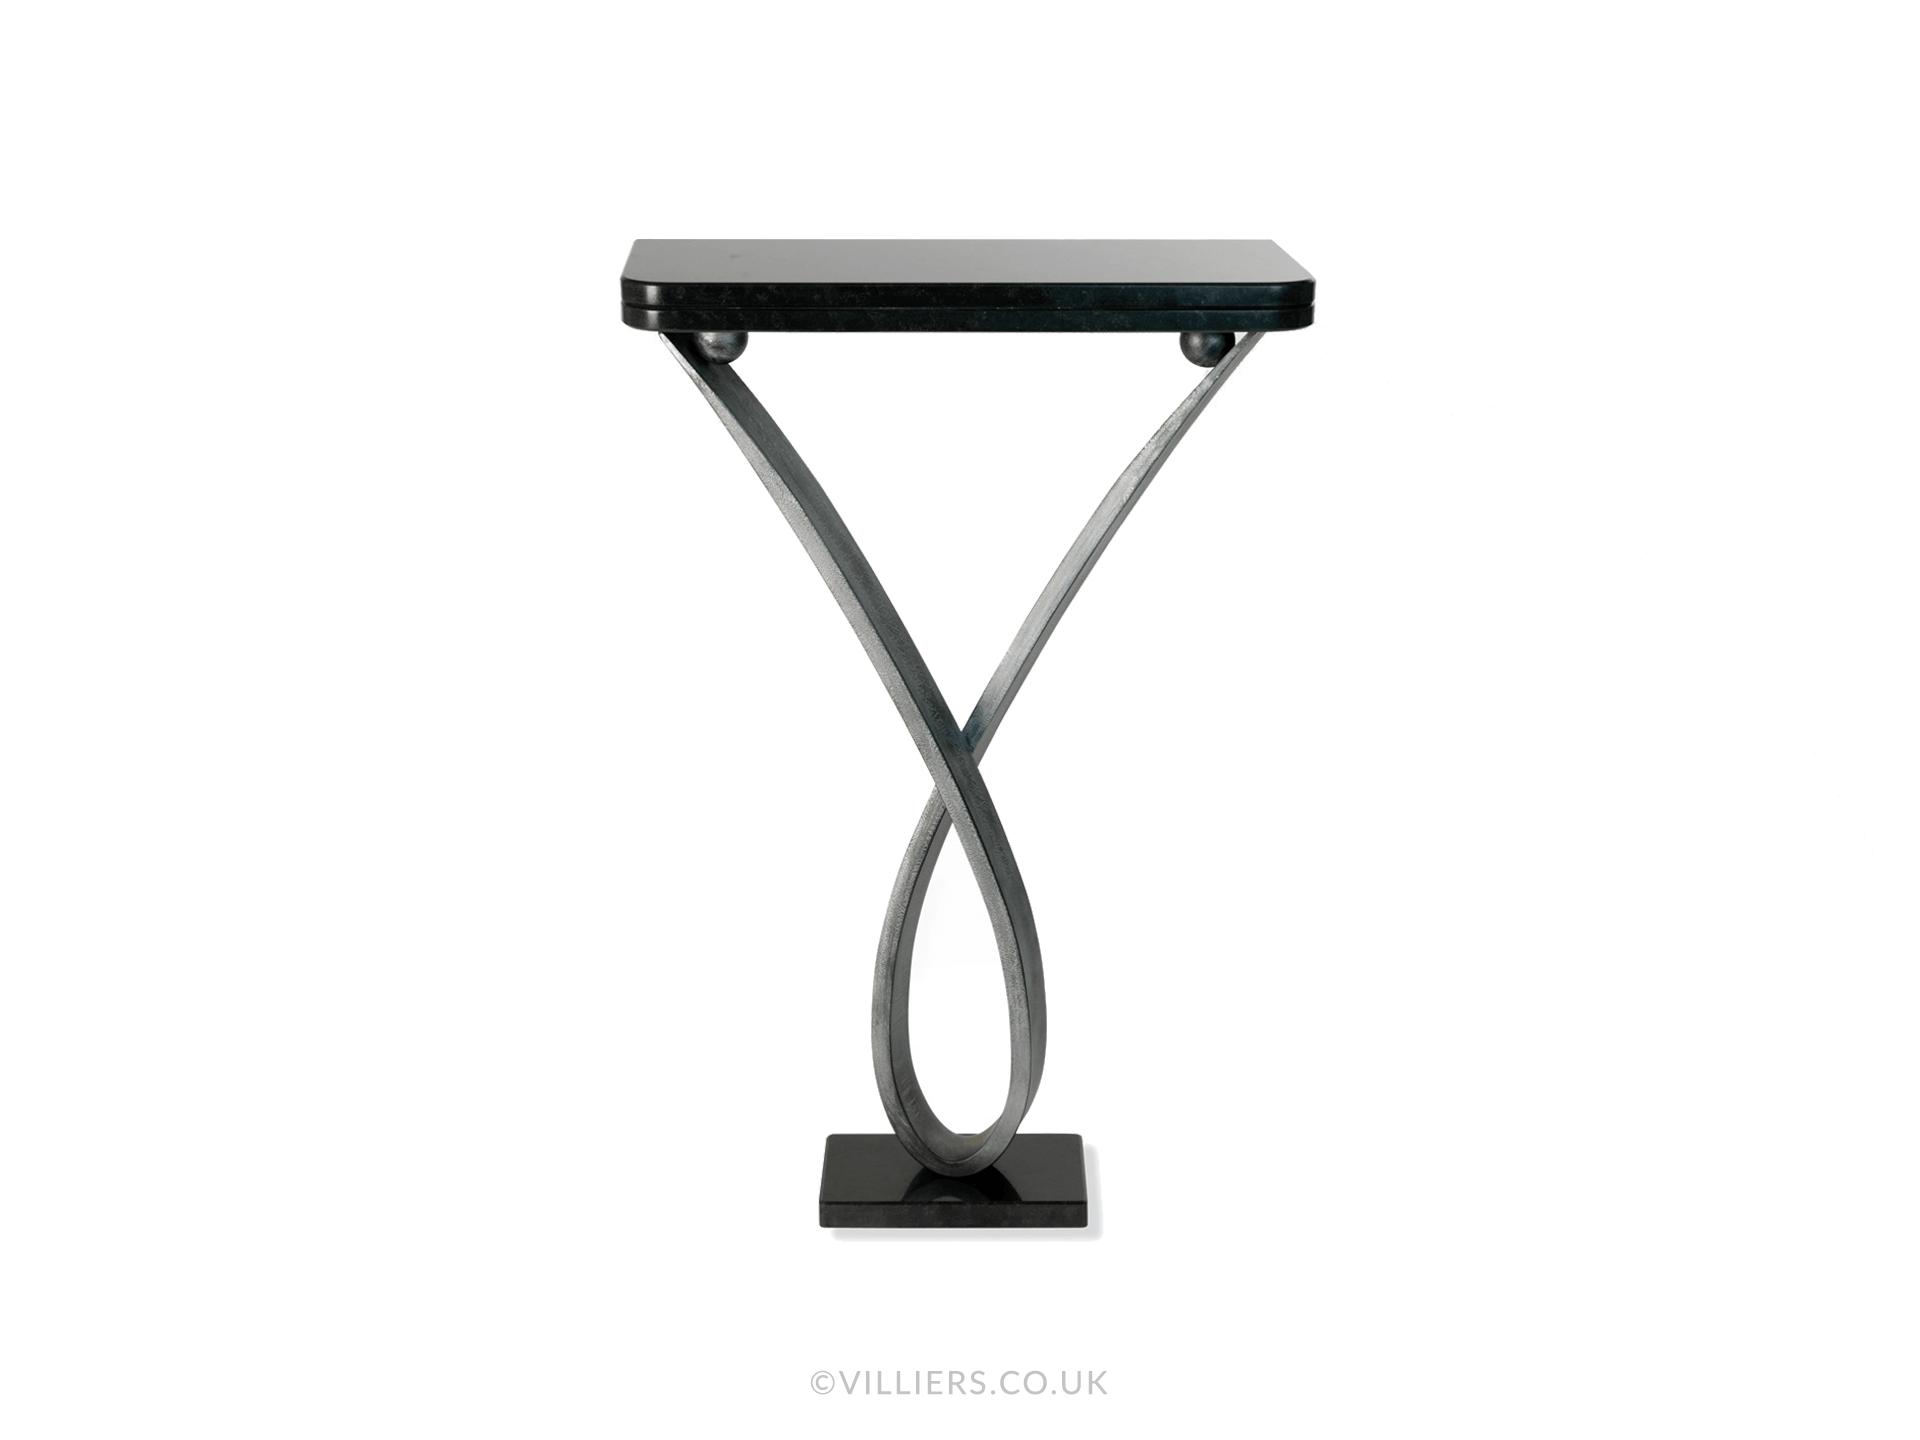 byron-console-table-01-1920x1440c